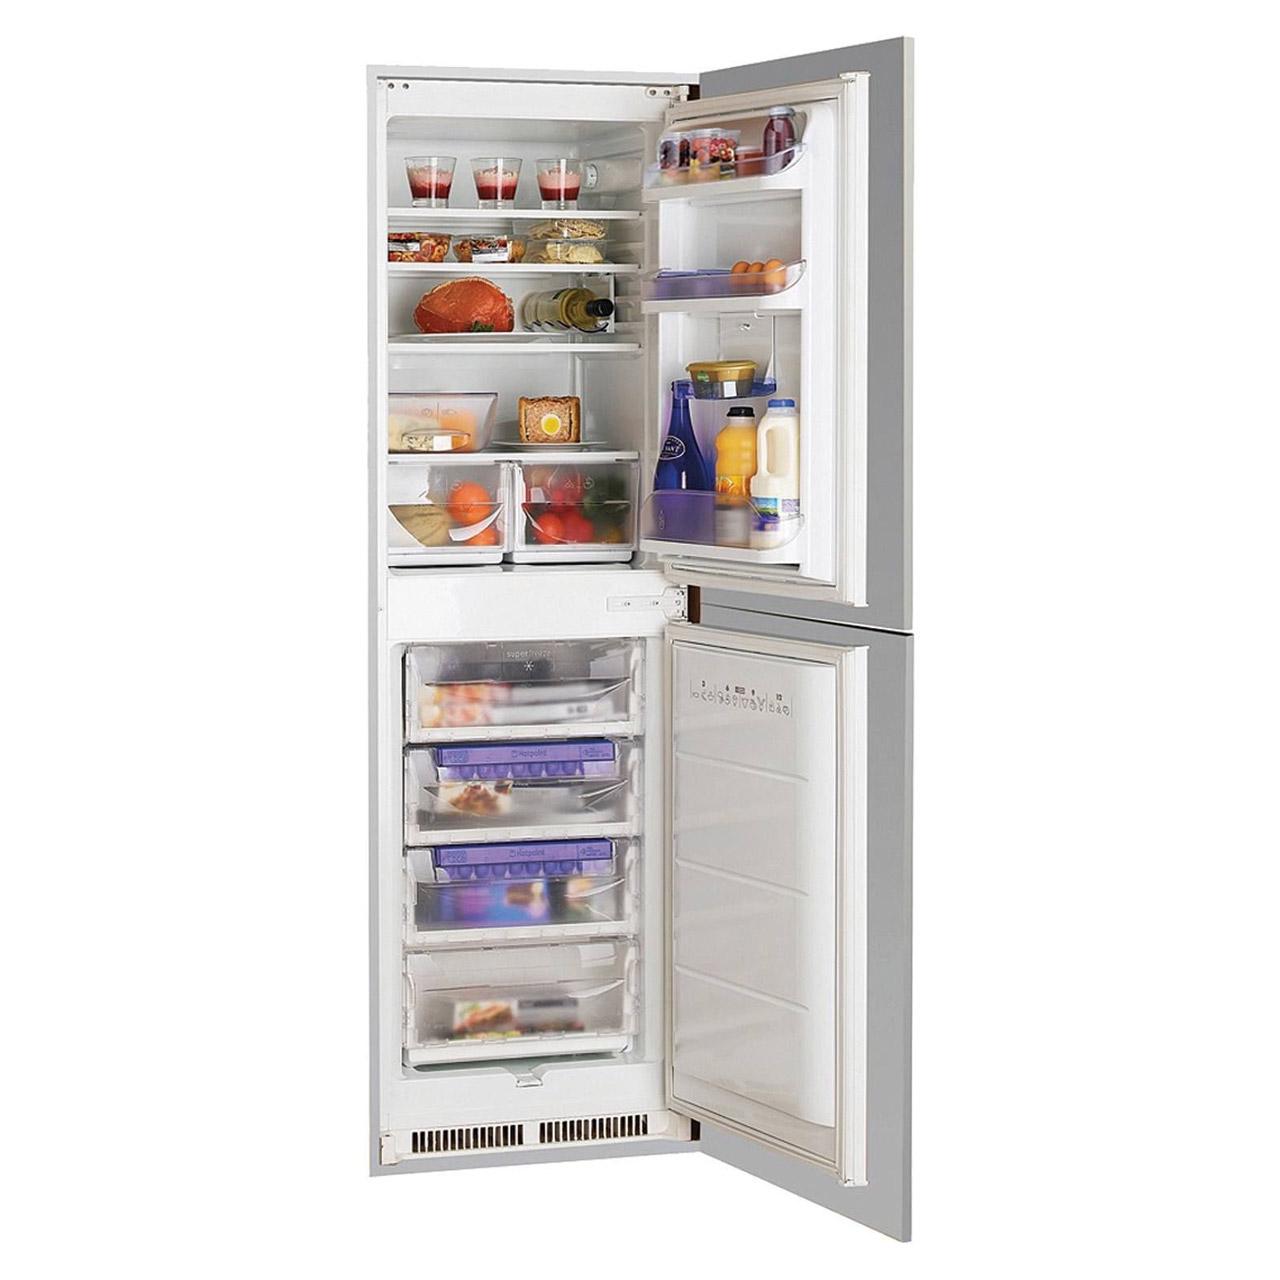 Hotpoint hrf3114uk integrated fridge freezer 50 50 static - Integrated freezer ...